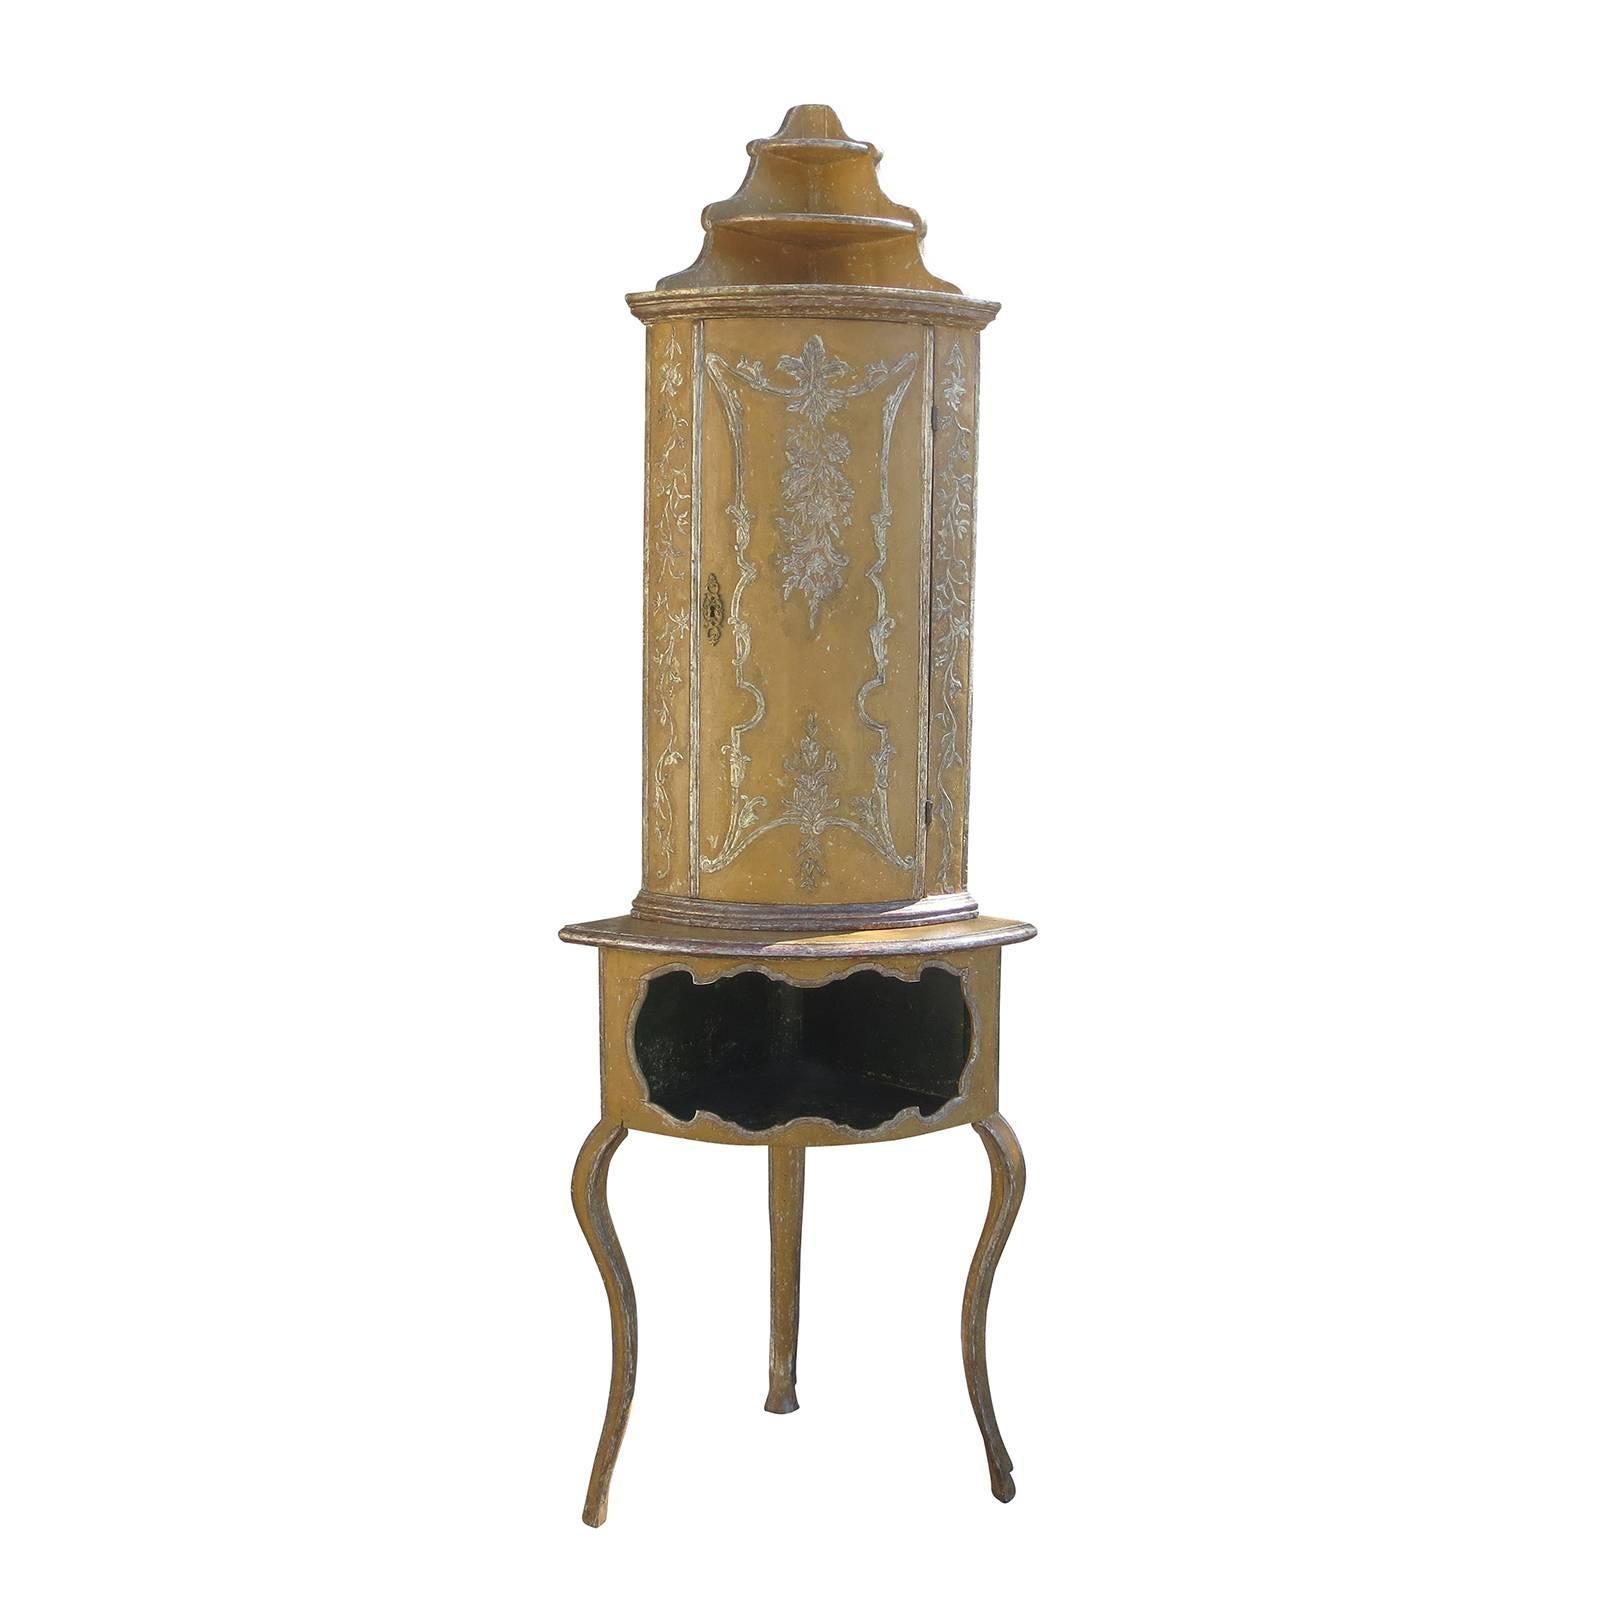 19th-20th Century Painted Italian Corner Cabinet